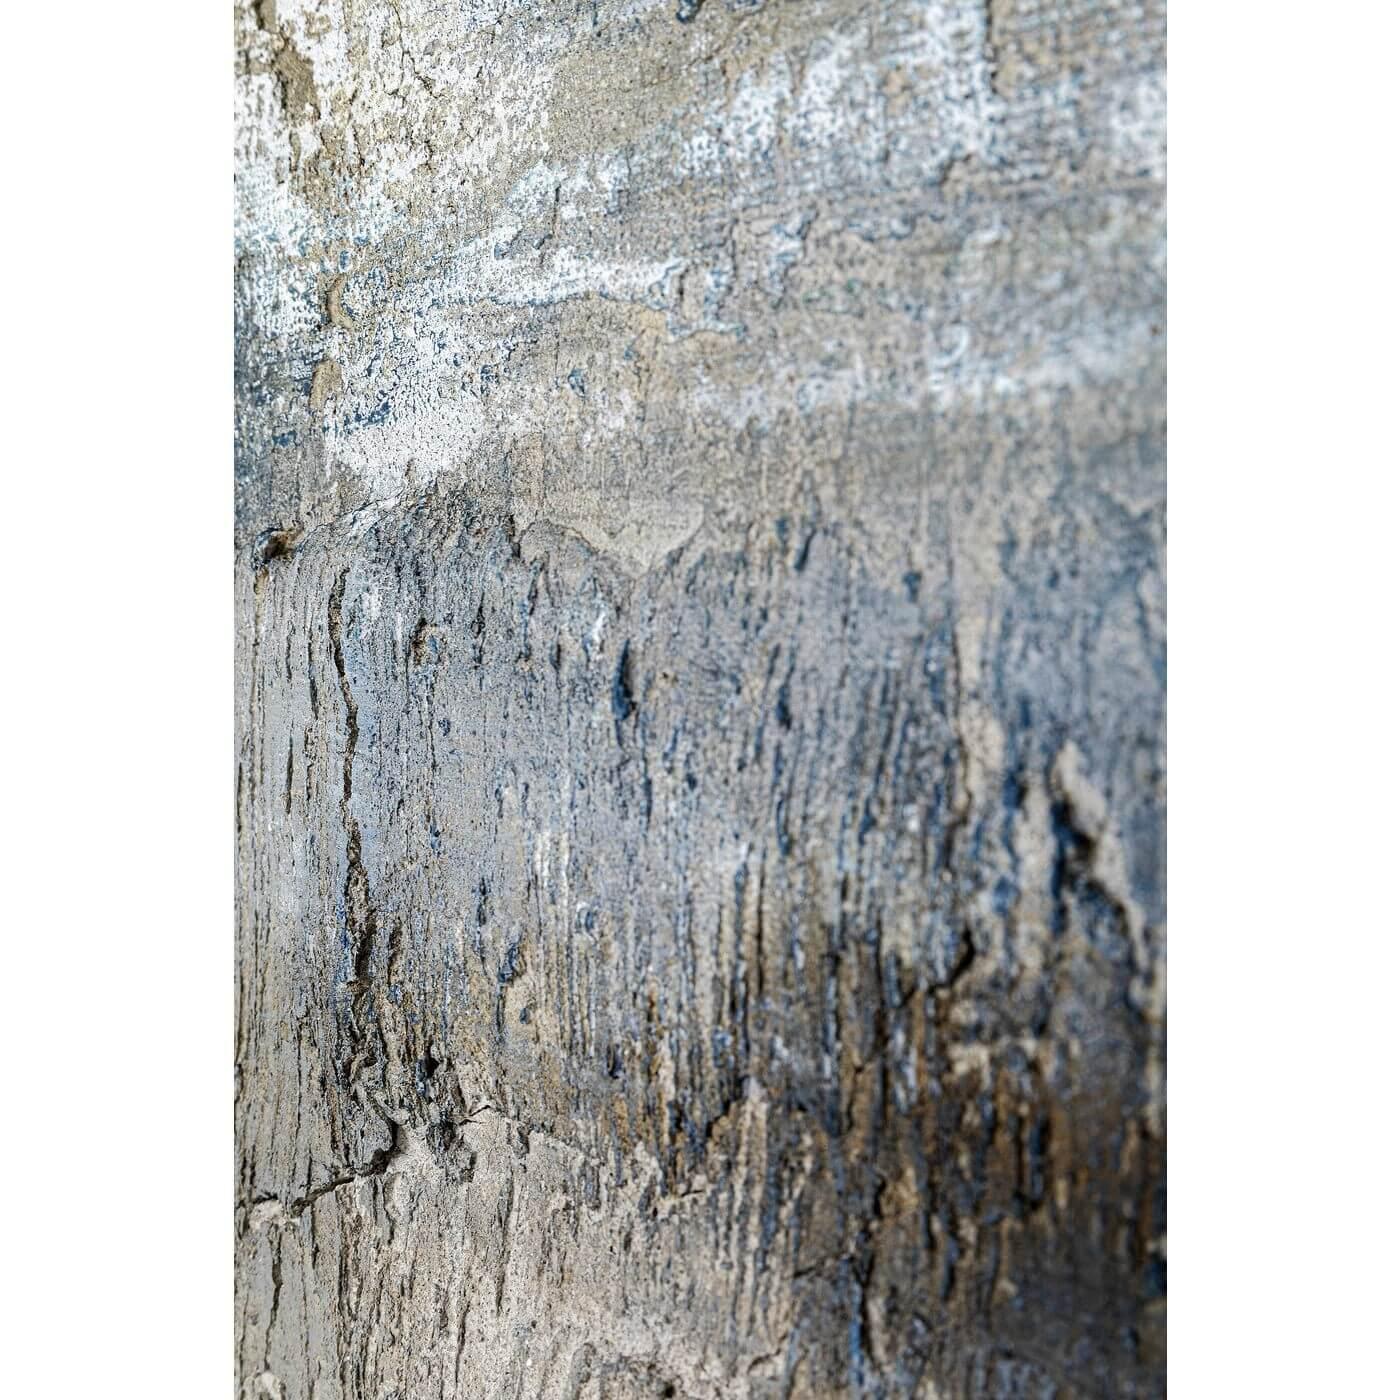 kare design – Kare design into the night abstrakt akryl maleri - blå/grå nuancer (120x90) på boboonline.dk